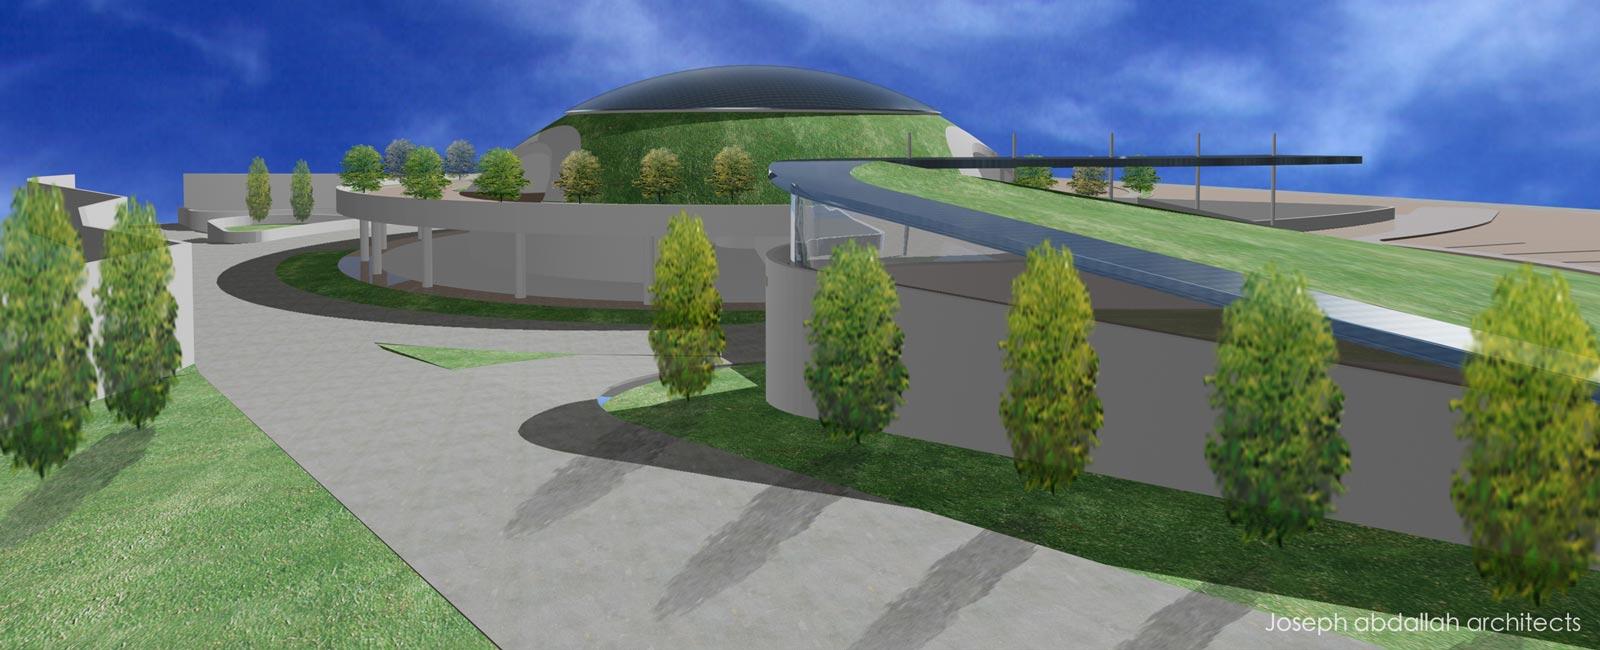 slaughterhouse-zhgharta-lebanon-modern-archiecture-eco-friendly-joseph-abdallah-architects-5